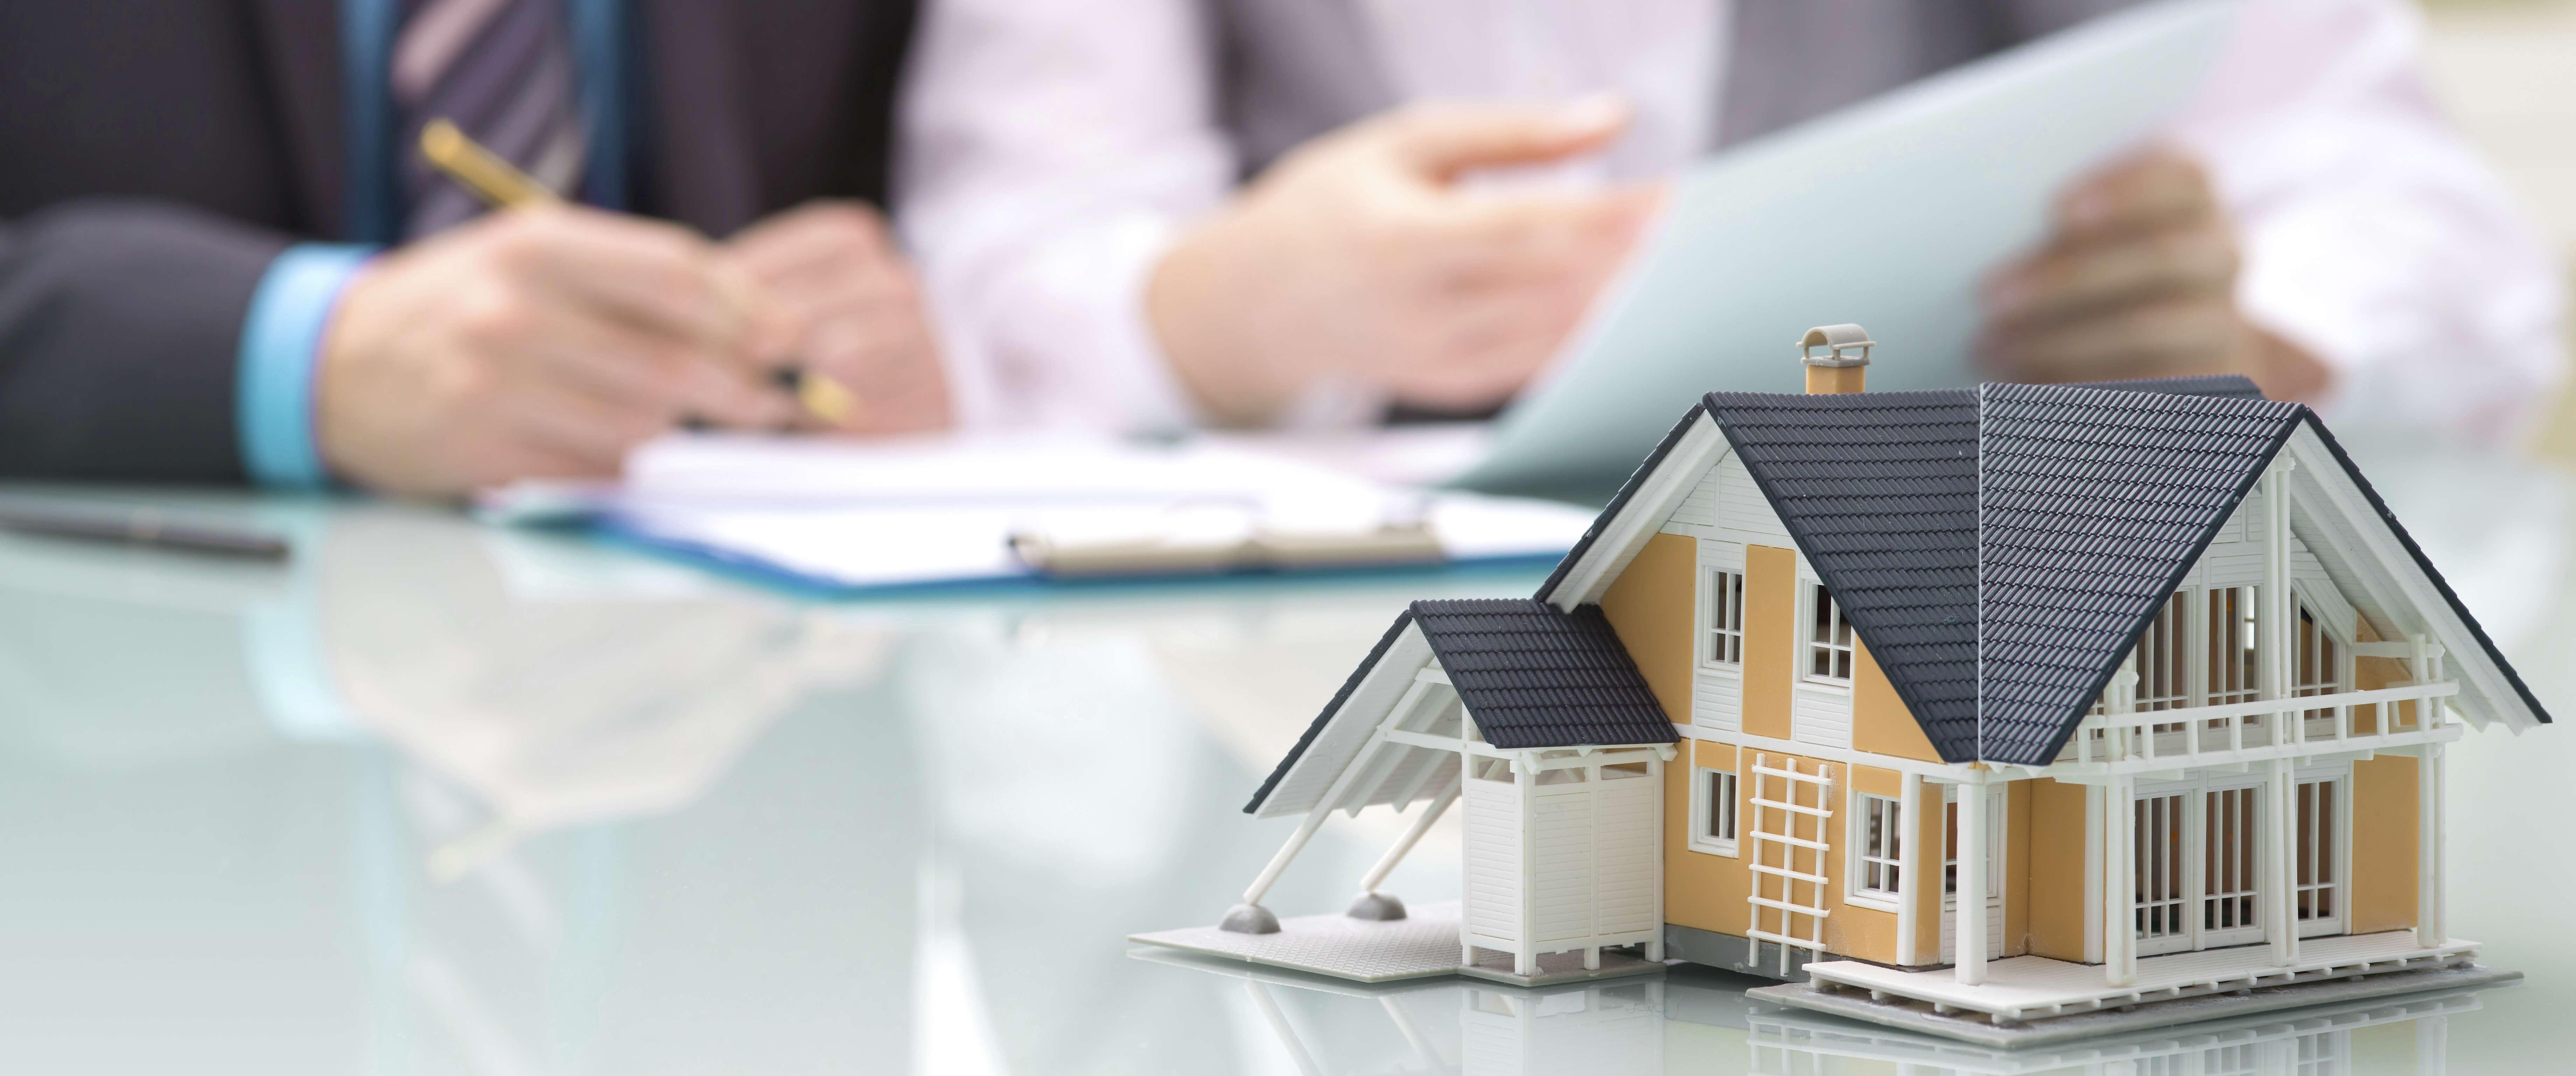 Intero Real Estate Services - Official Site Real estate photo service